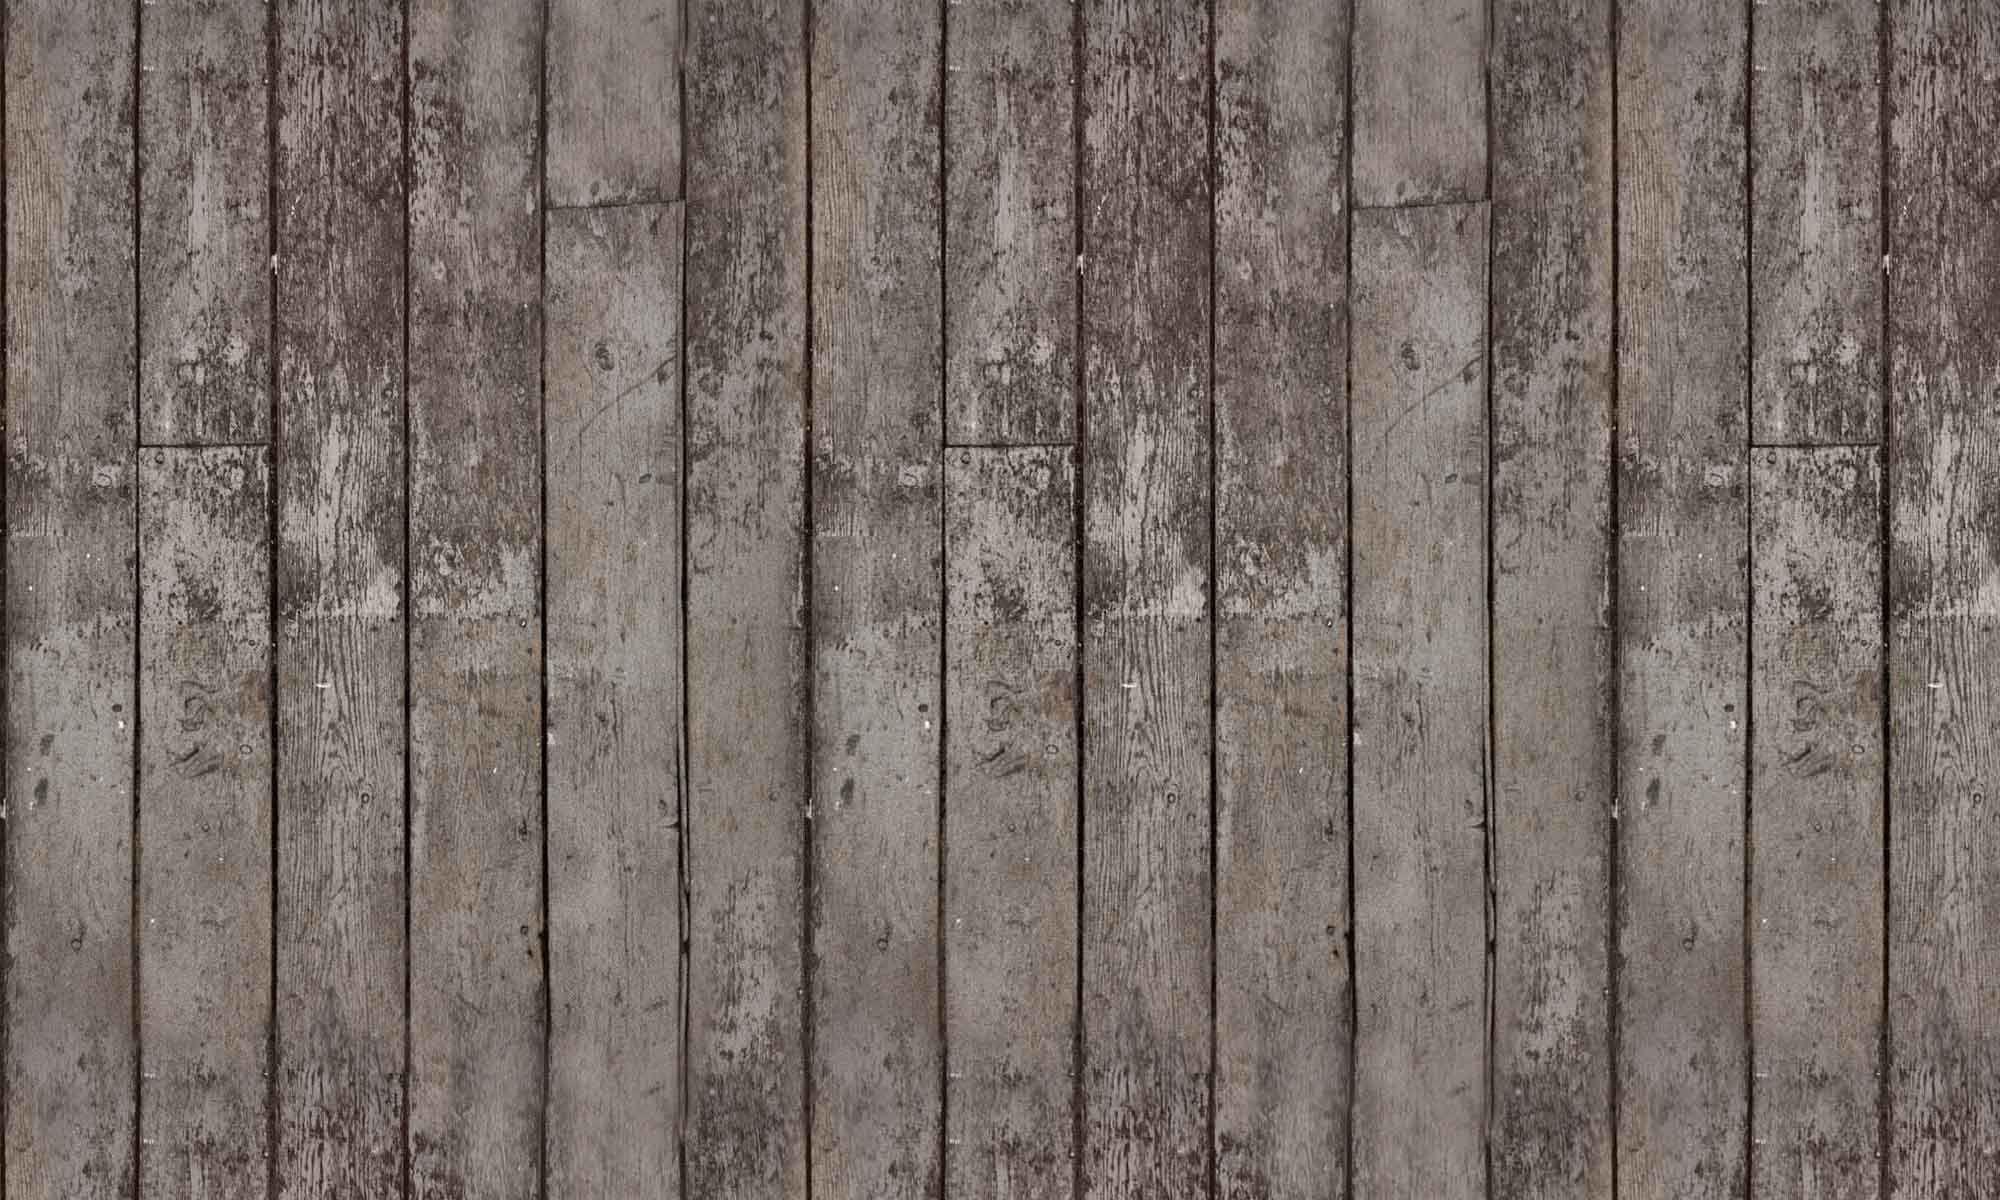 hardwood flooring auburn al of 2013 accessories catalog pages 1 24 text version fliphtml5 in languagechange